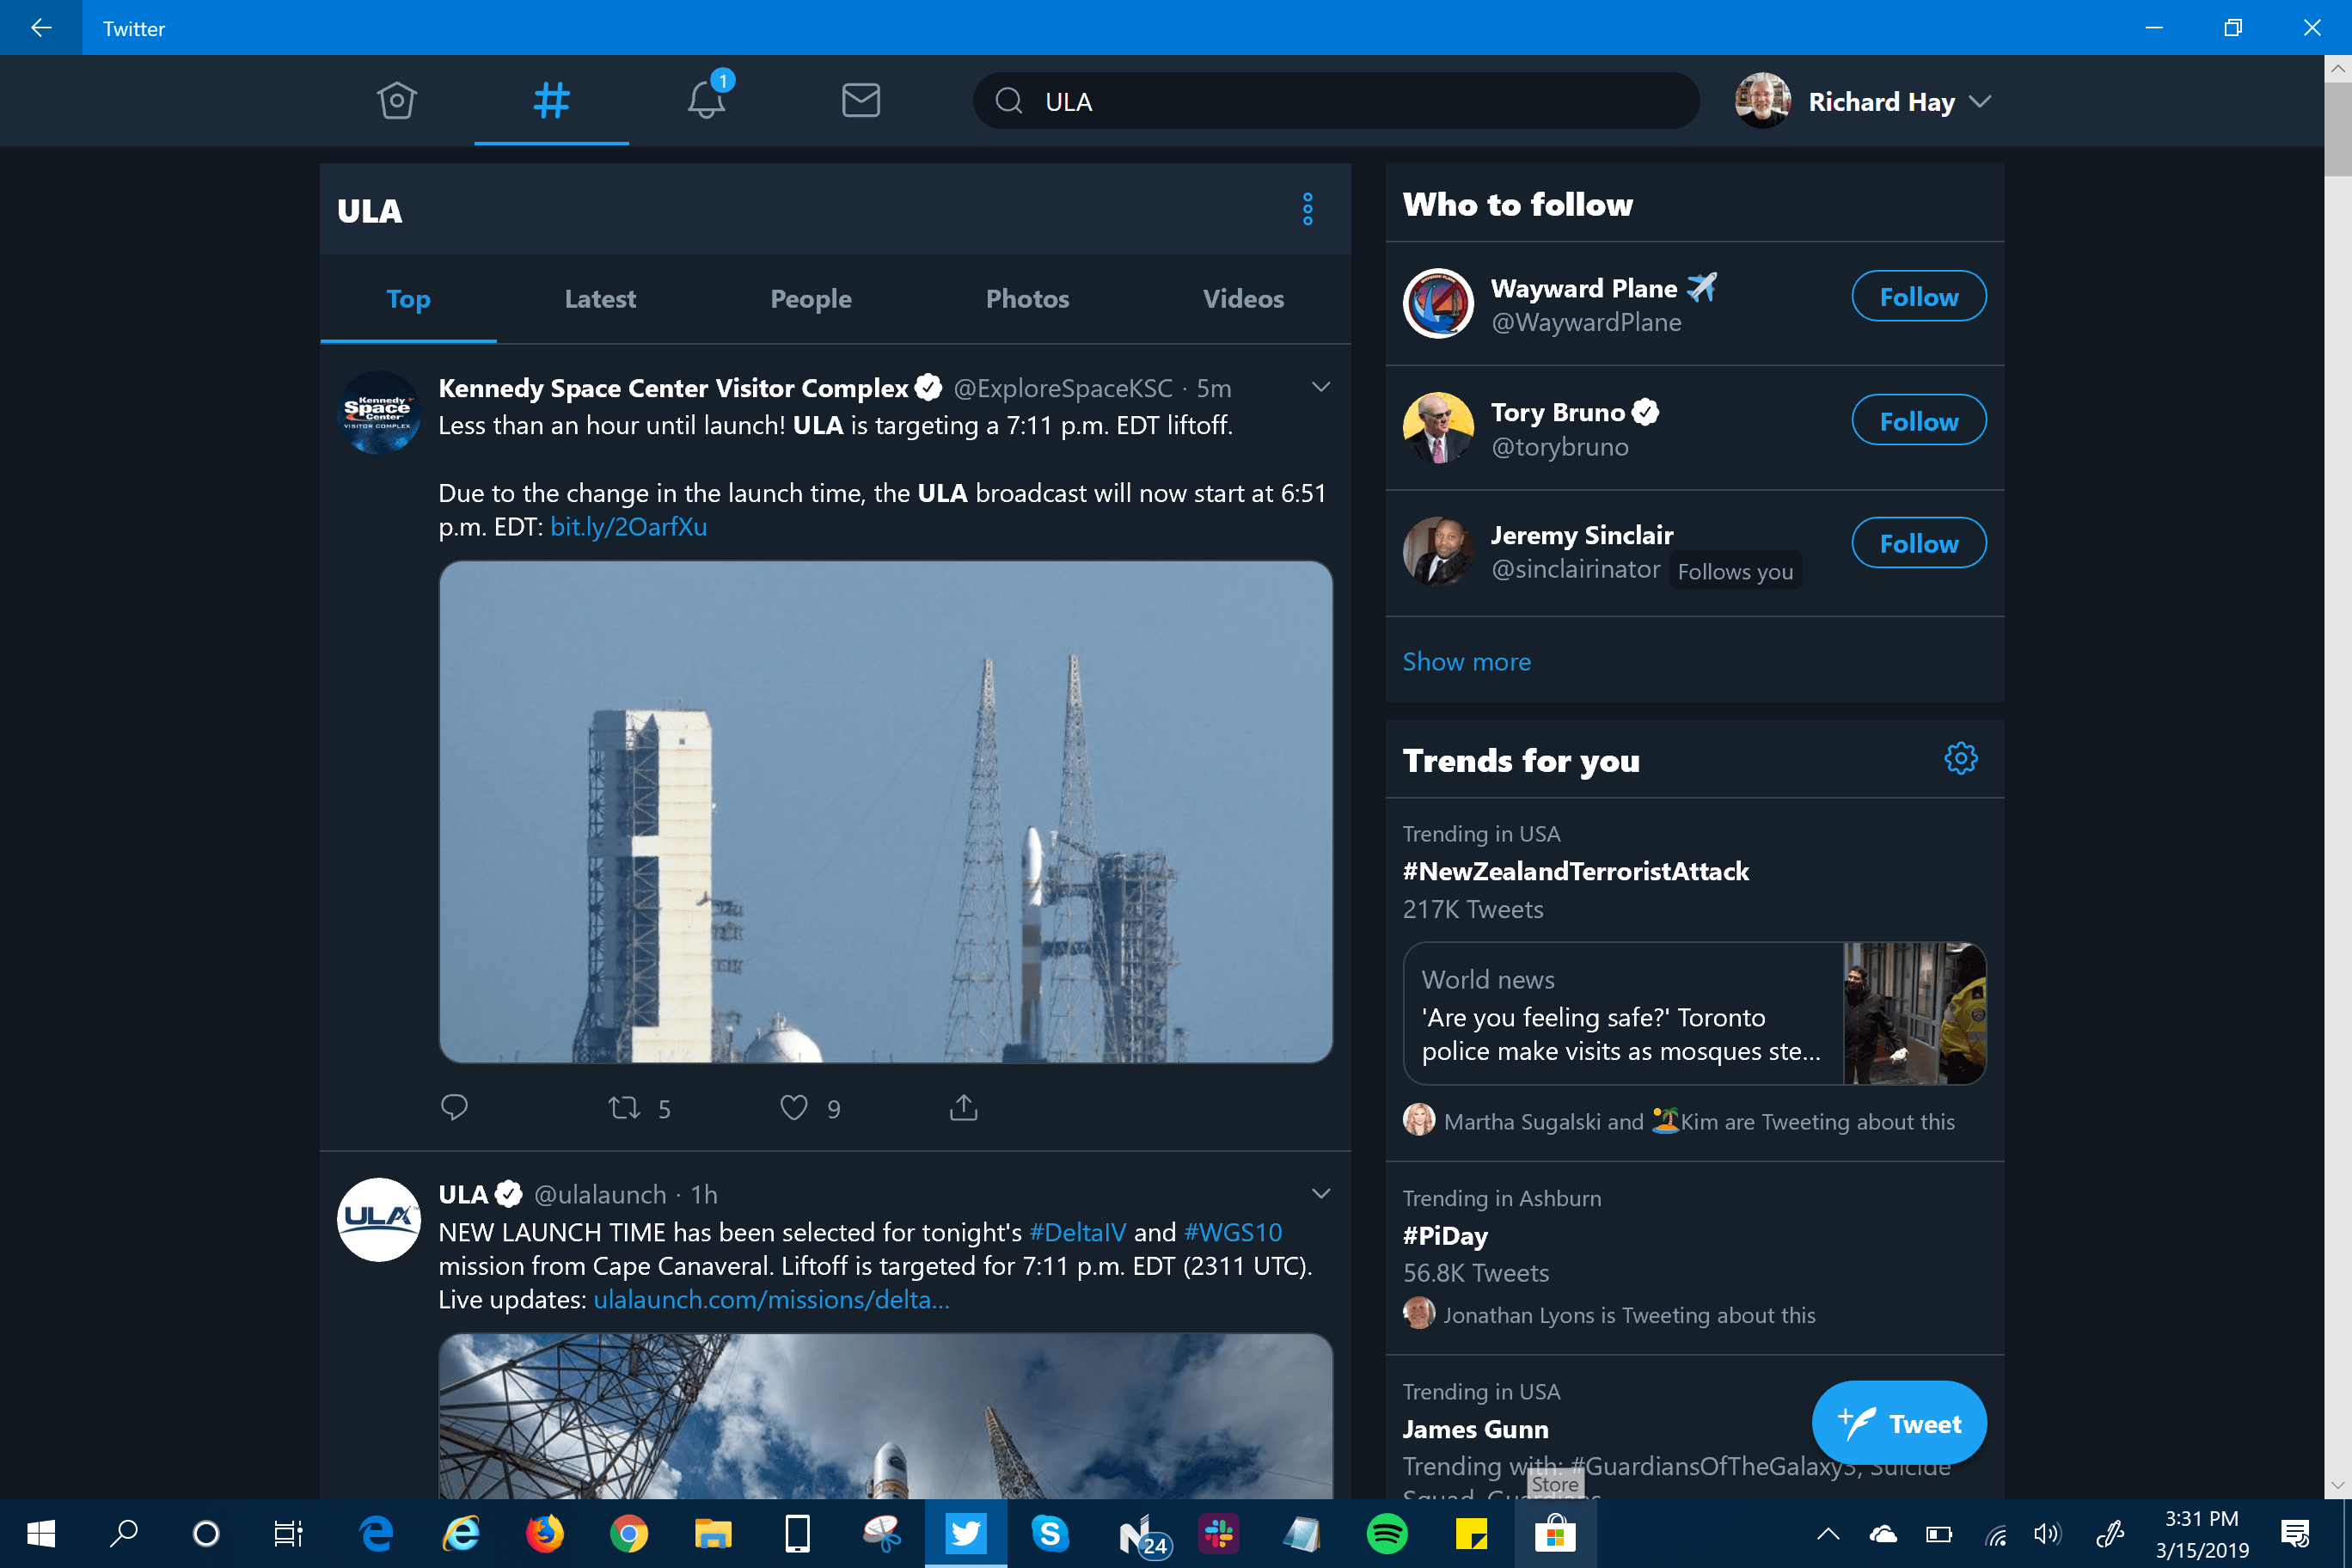 Windows 10 Twitter App Old UI